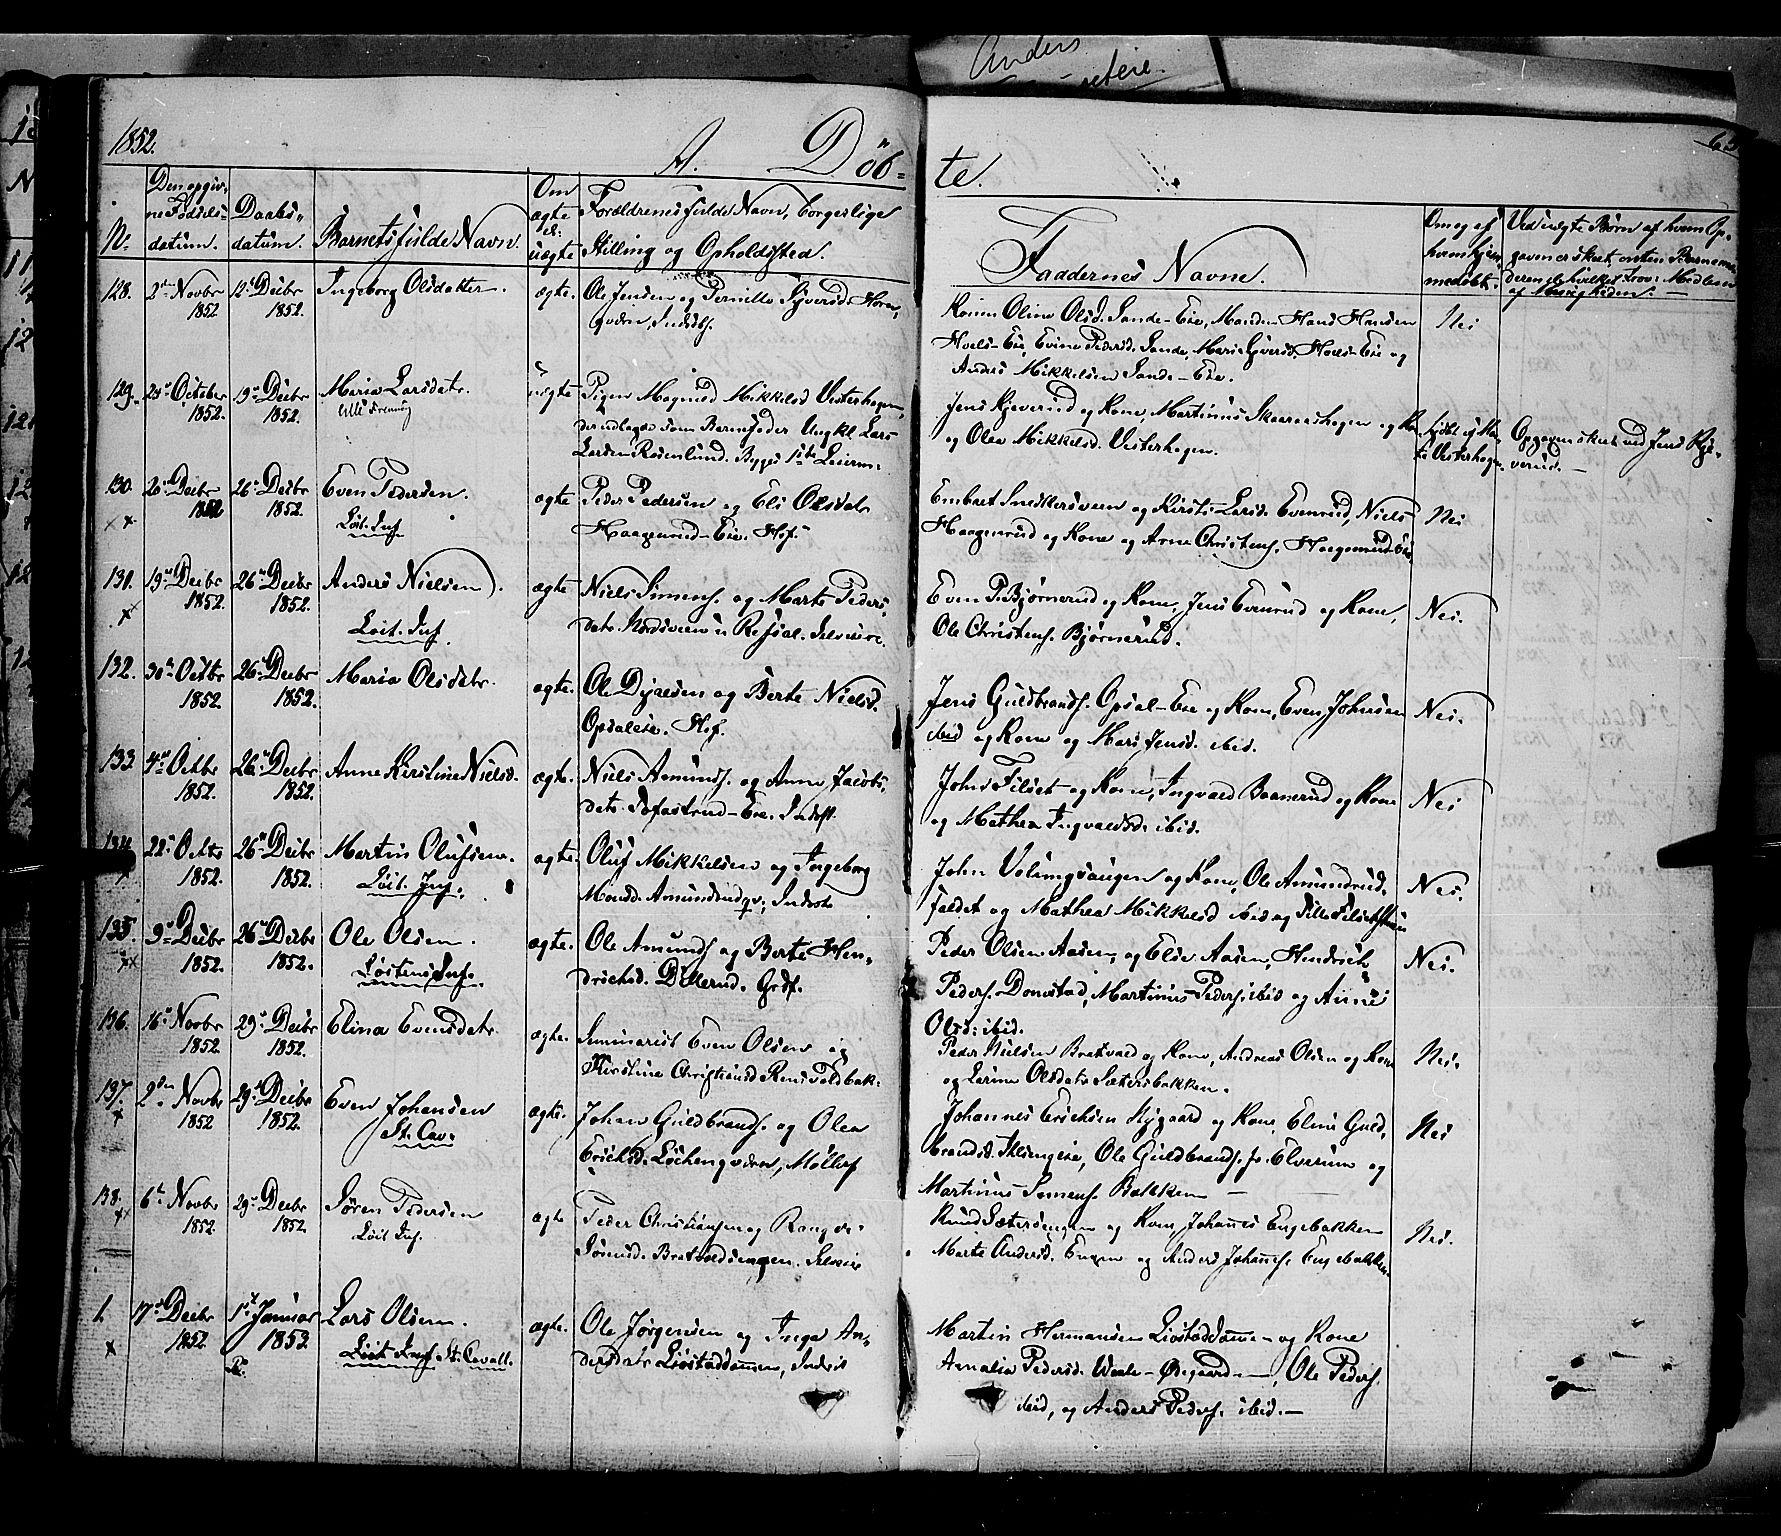 SAH, Romedal prestekontor, K/L0004: Ministerialbok nr. 4, 1847-1861, s. 65